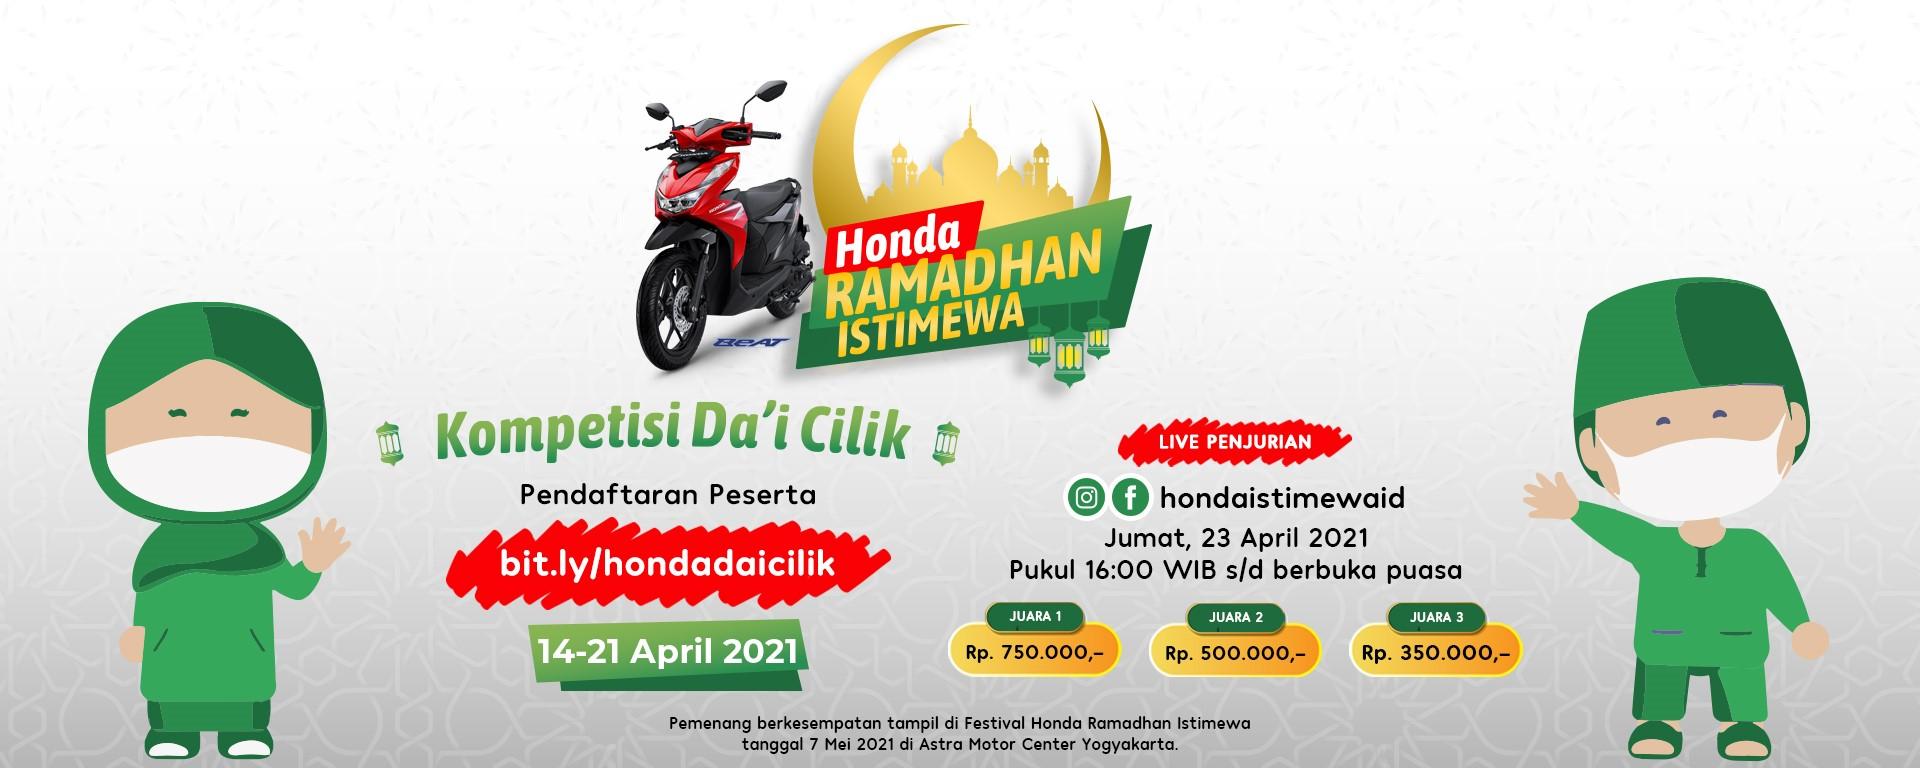 Honda Da'i Cilik Competition